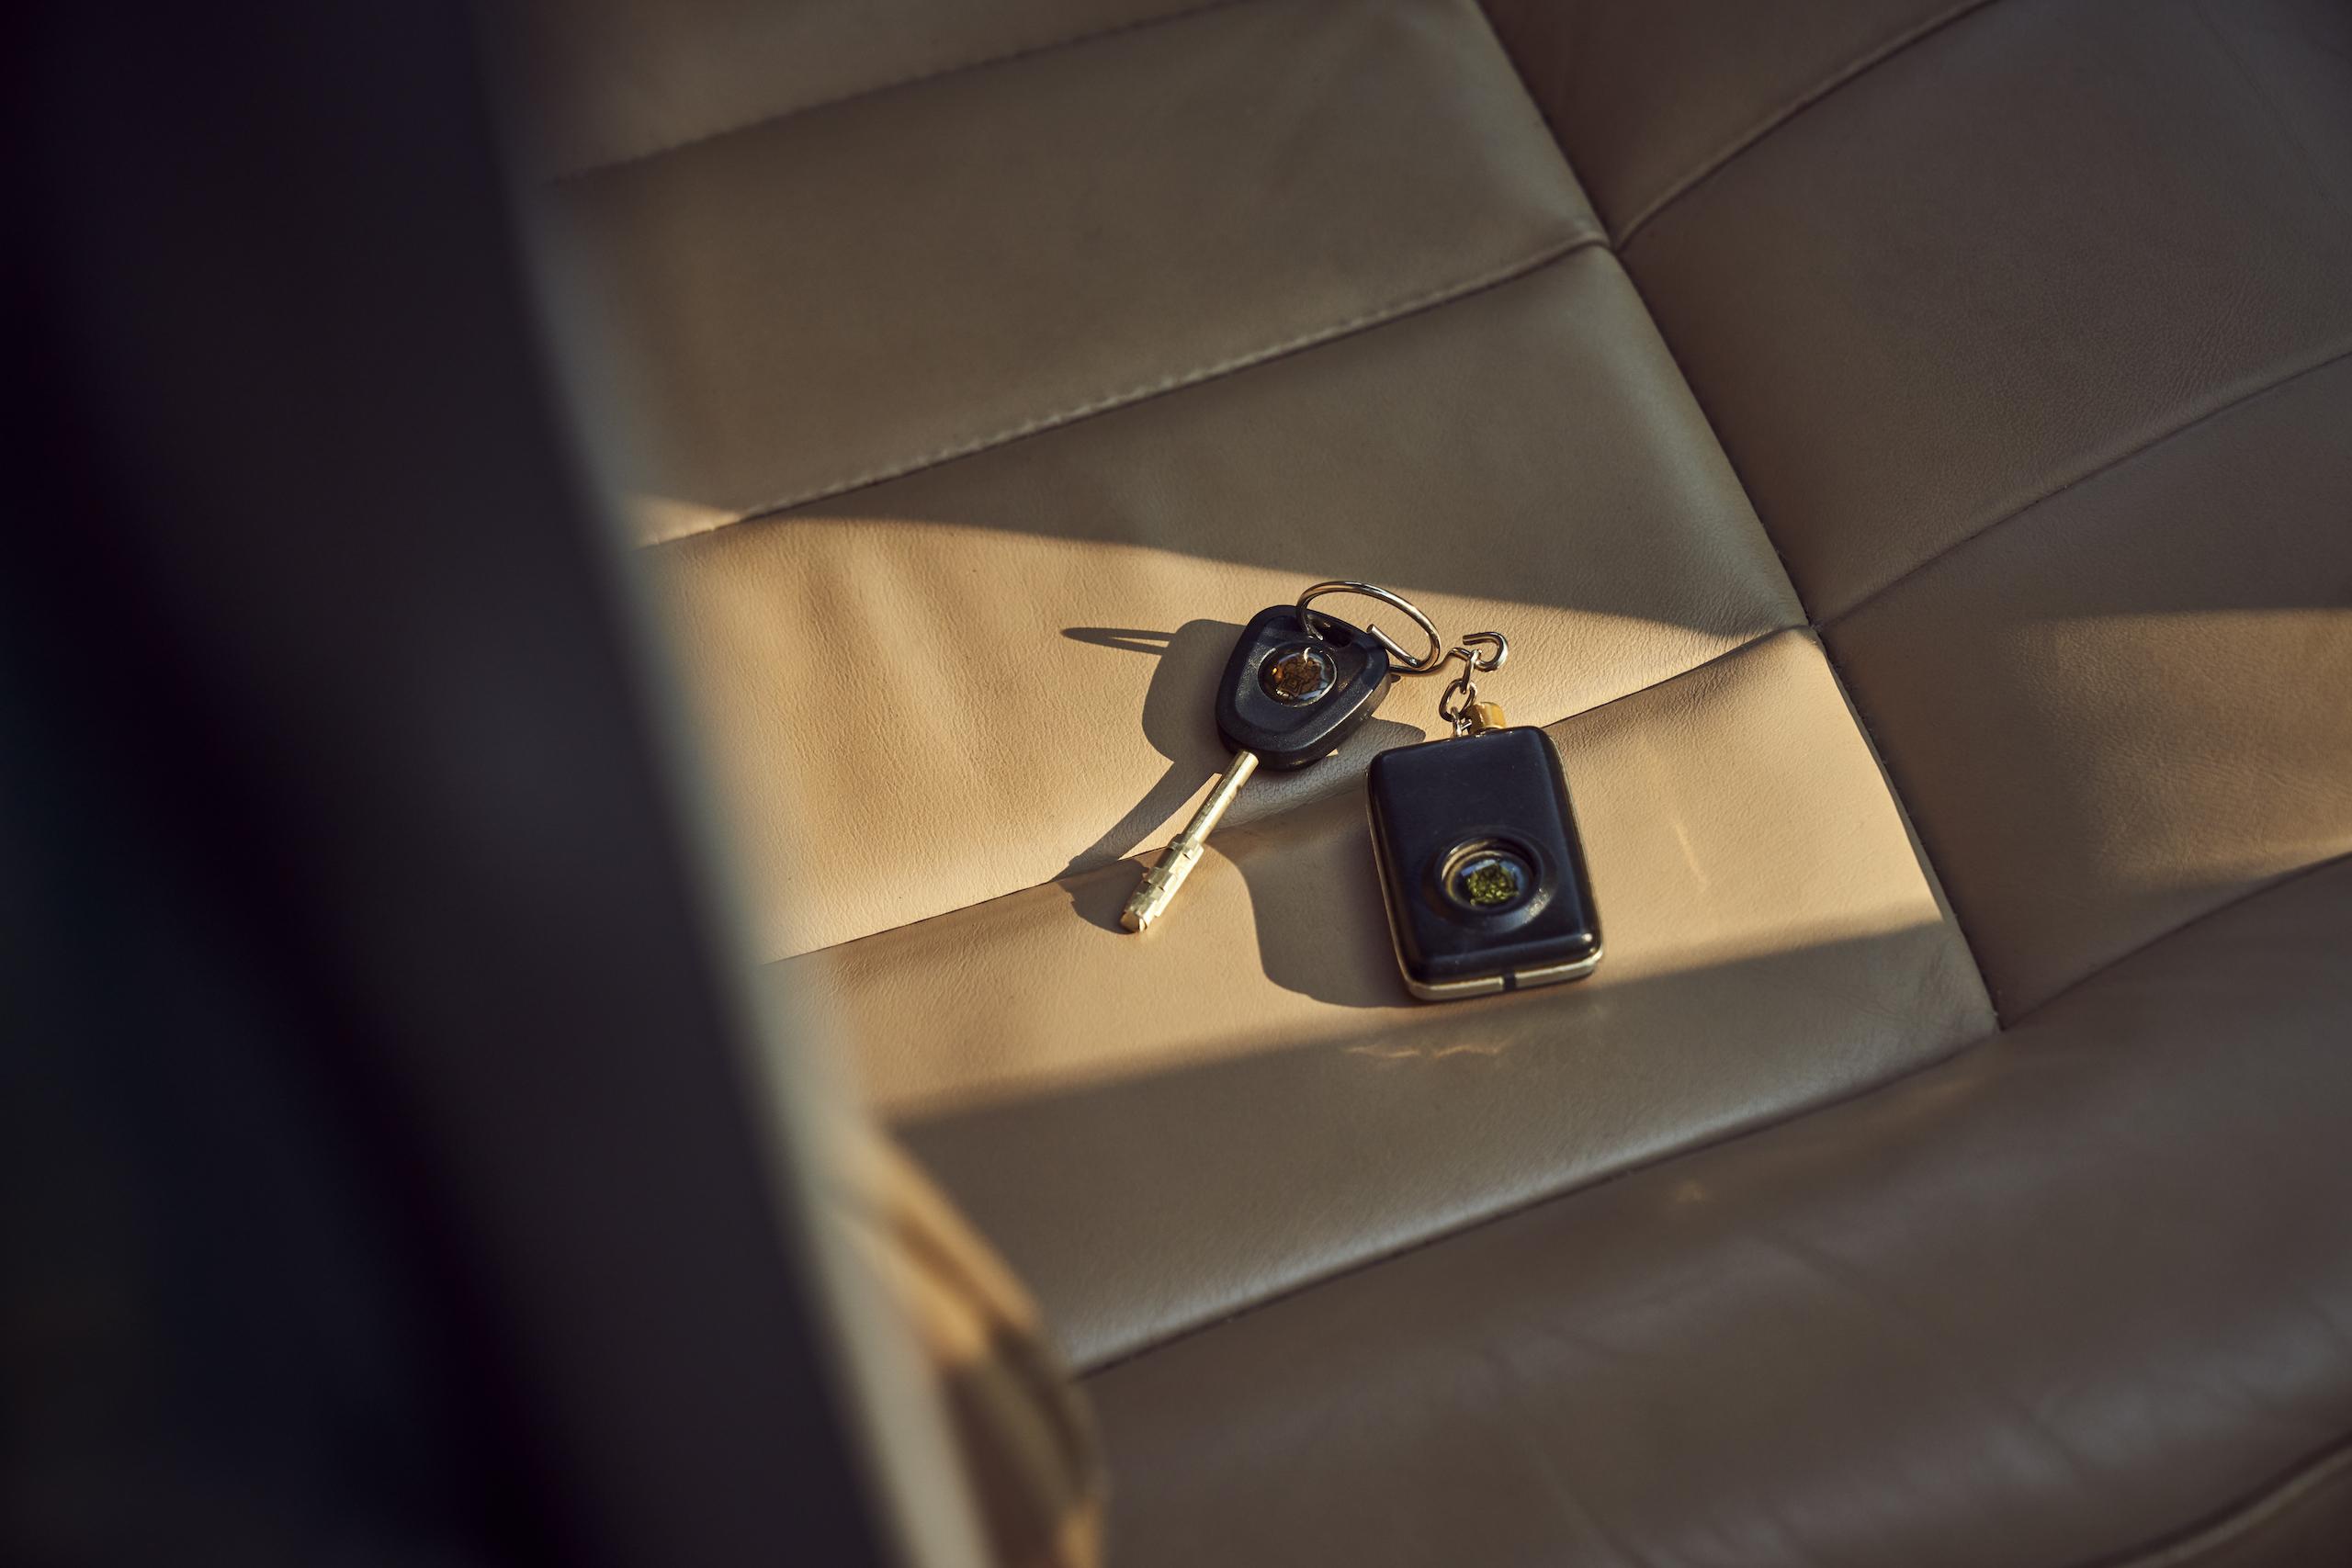 Jaguar XJ6 keys on leather seat